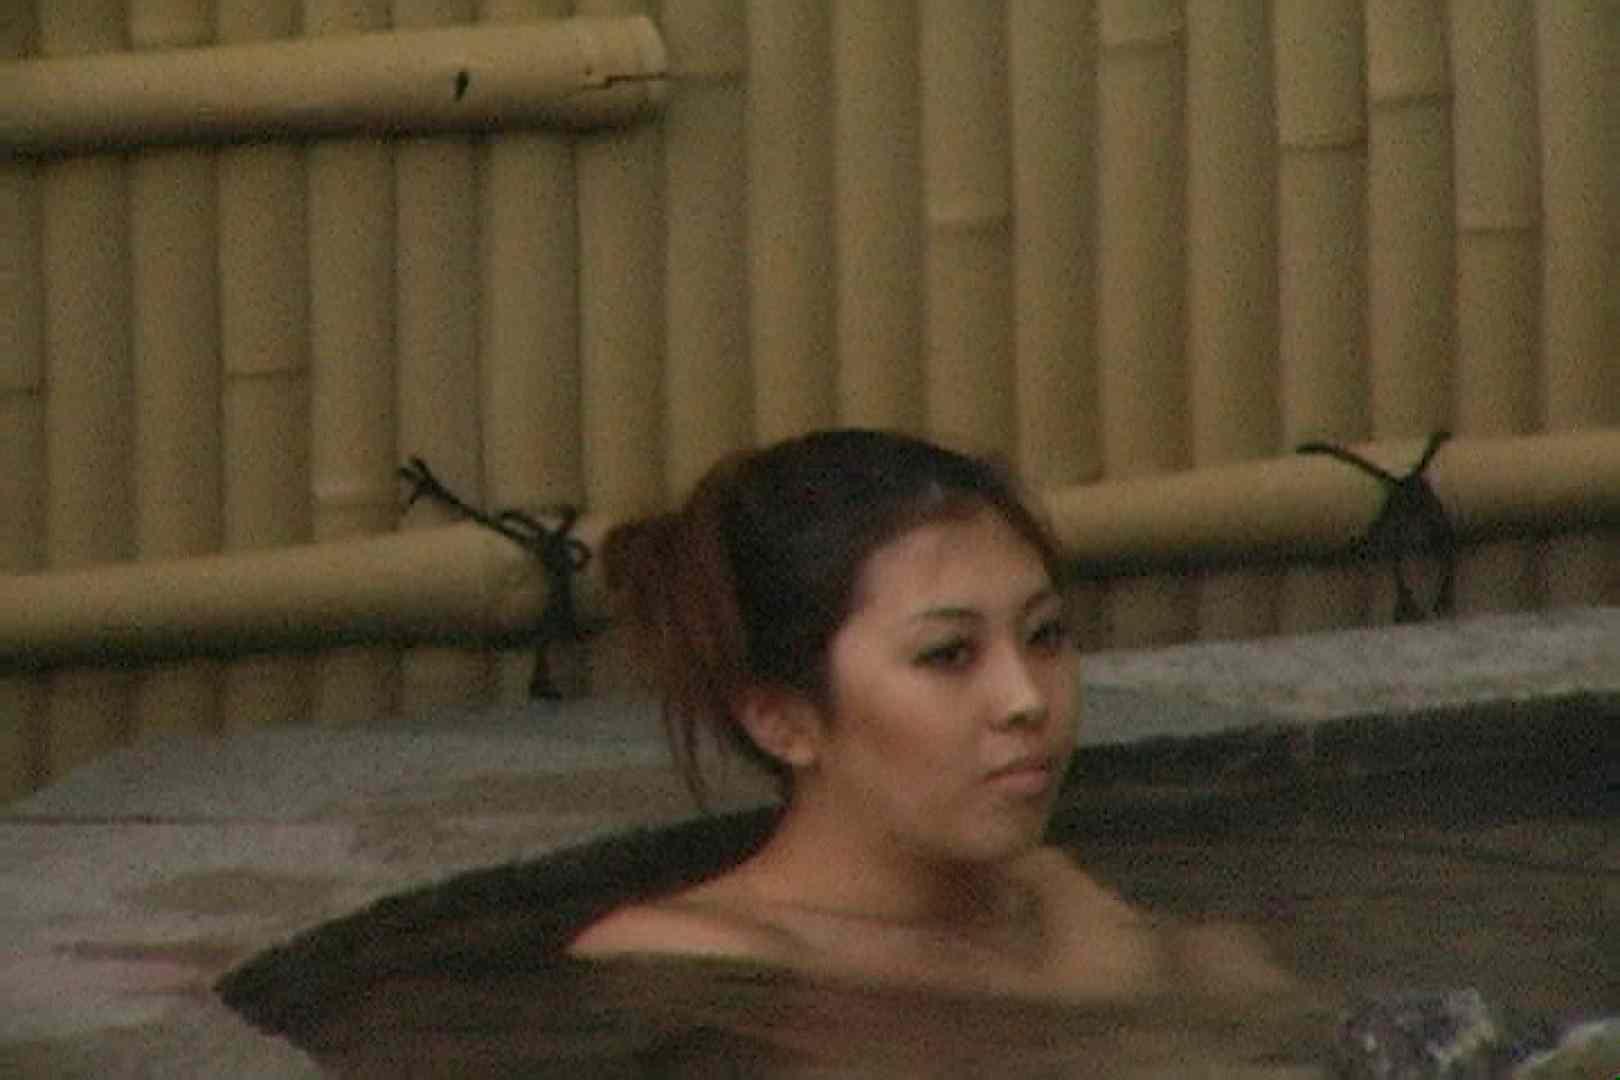 Aquaな露天風呂Vol.24 露天   HなOL  70pic 35